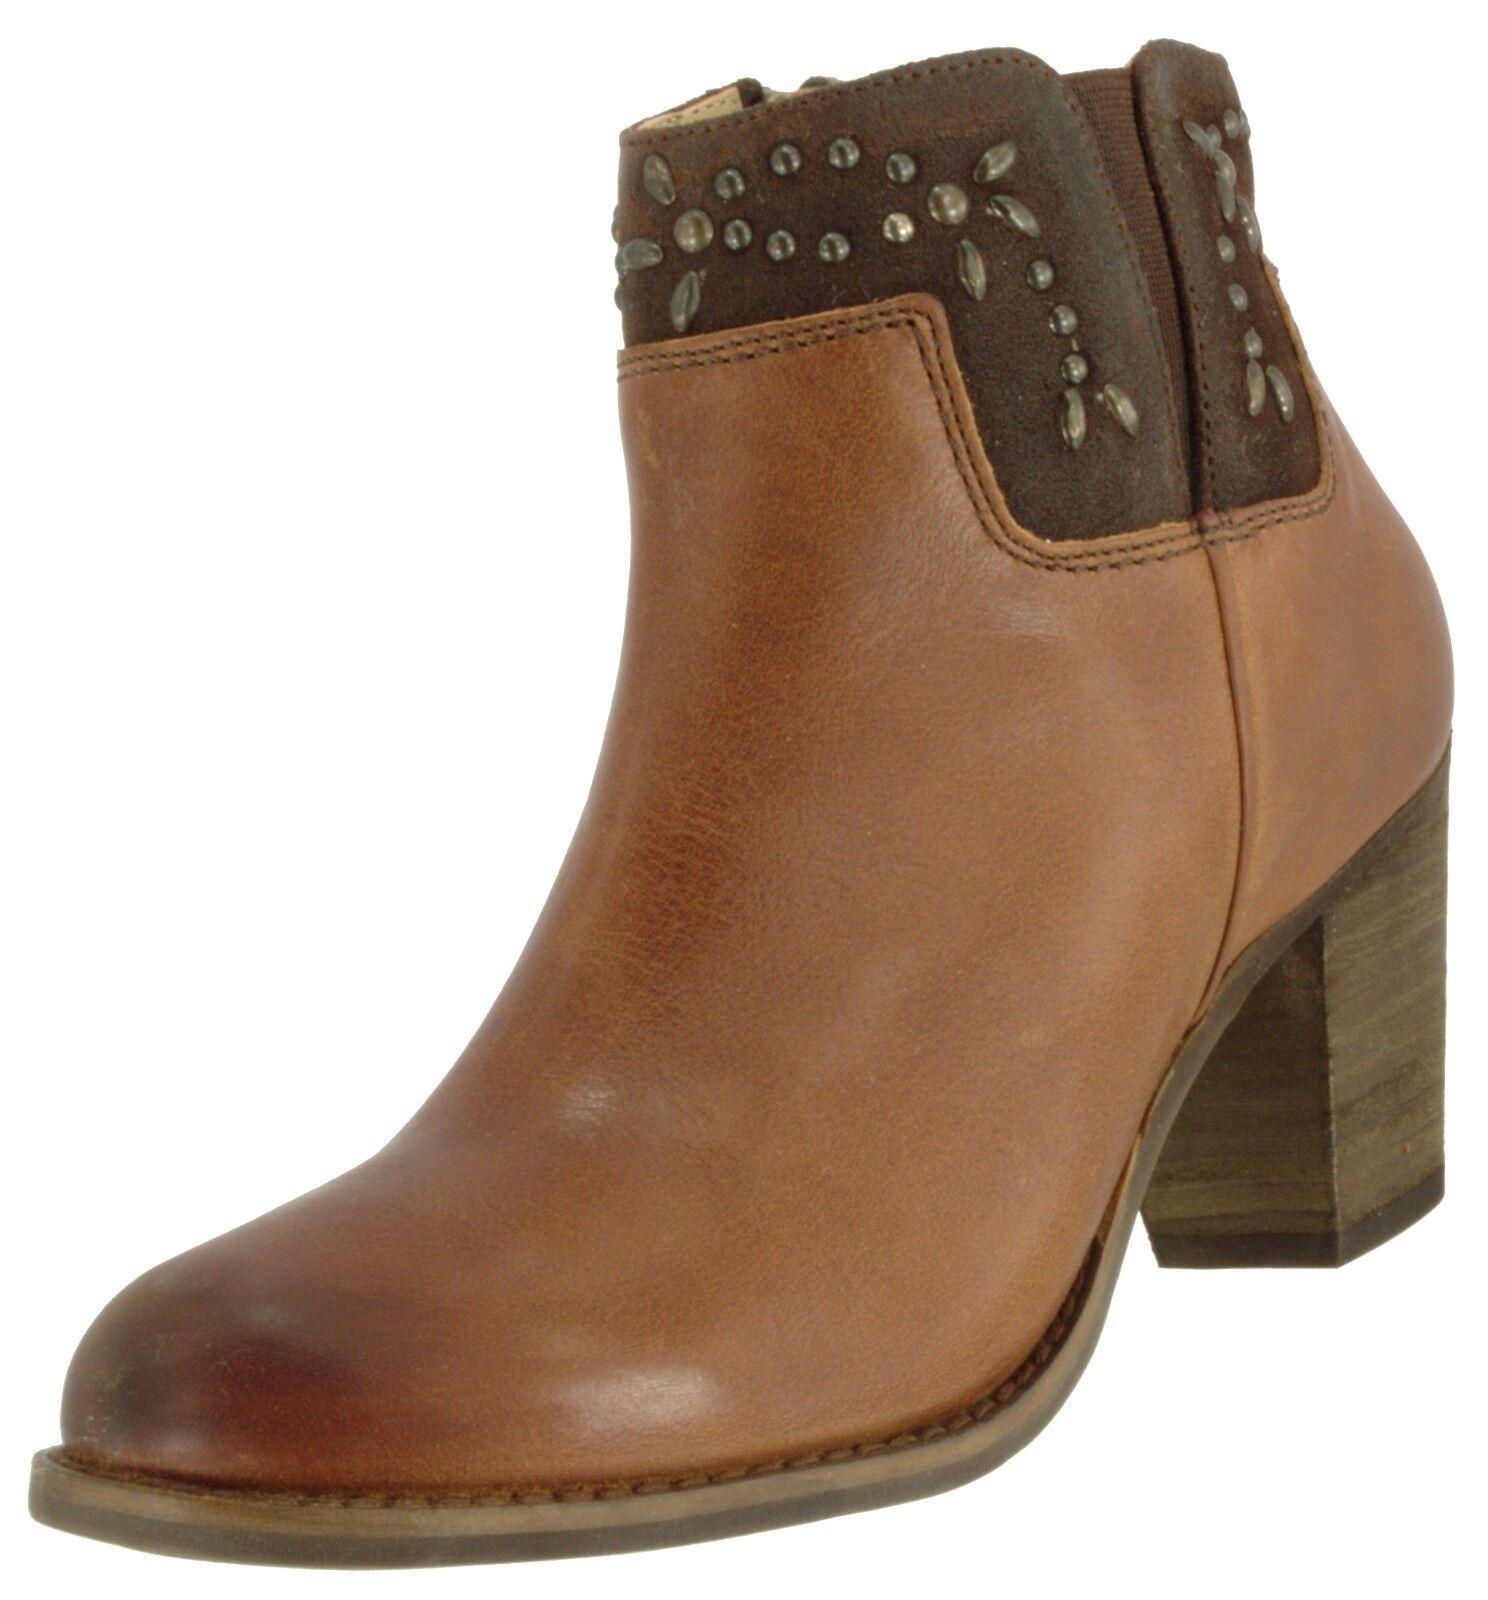 OLUKAI SAMPLE 20331 damen HO'OHILU LEATHER SIDE ZIP ANKLE Stiefel Stiefel Stiefel US 7, EUR 37 ce77f6